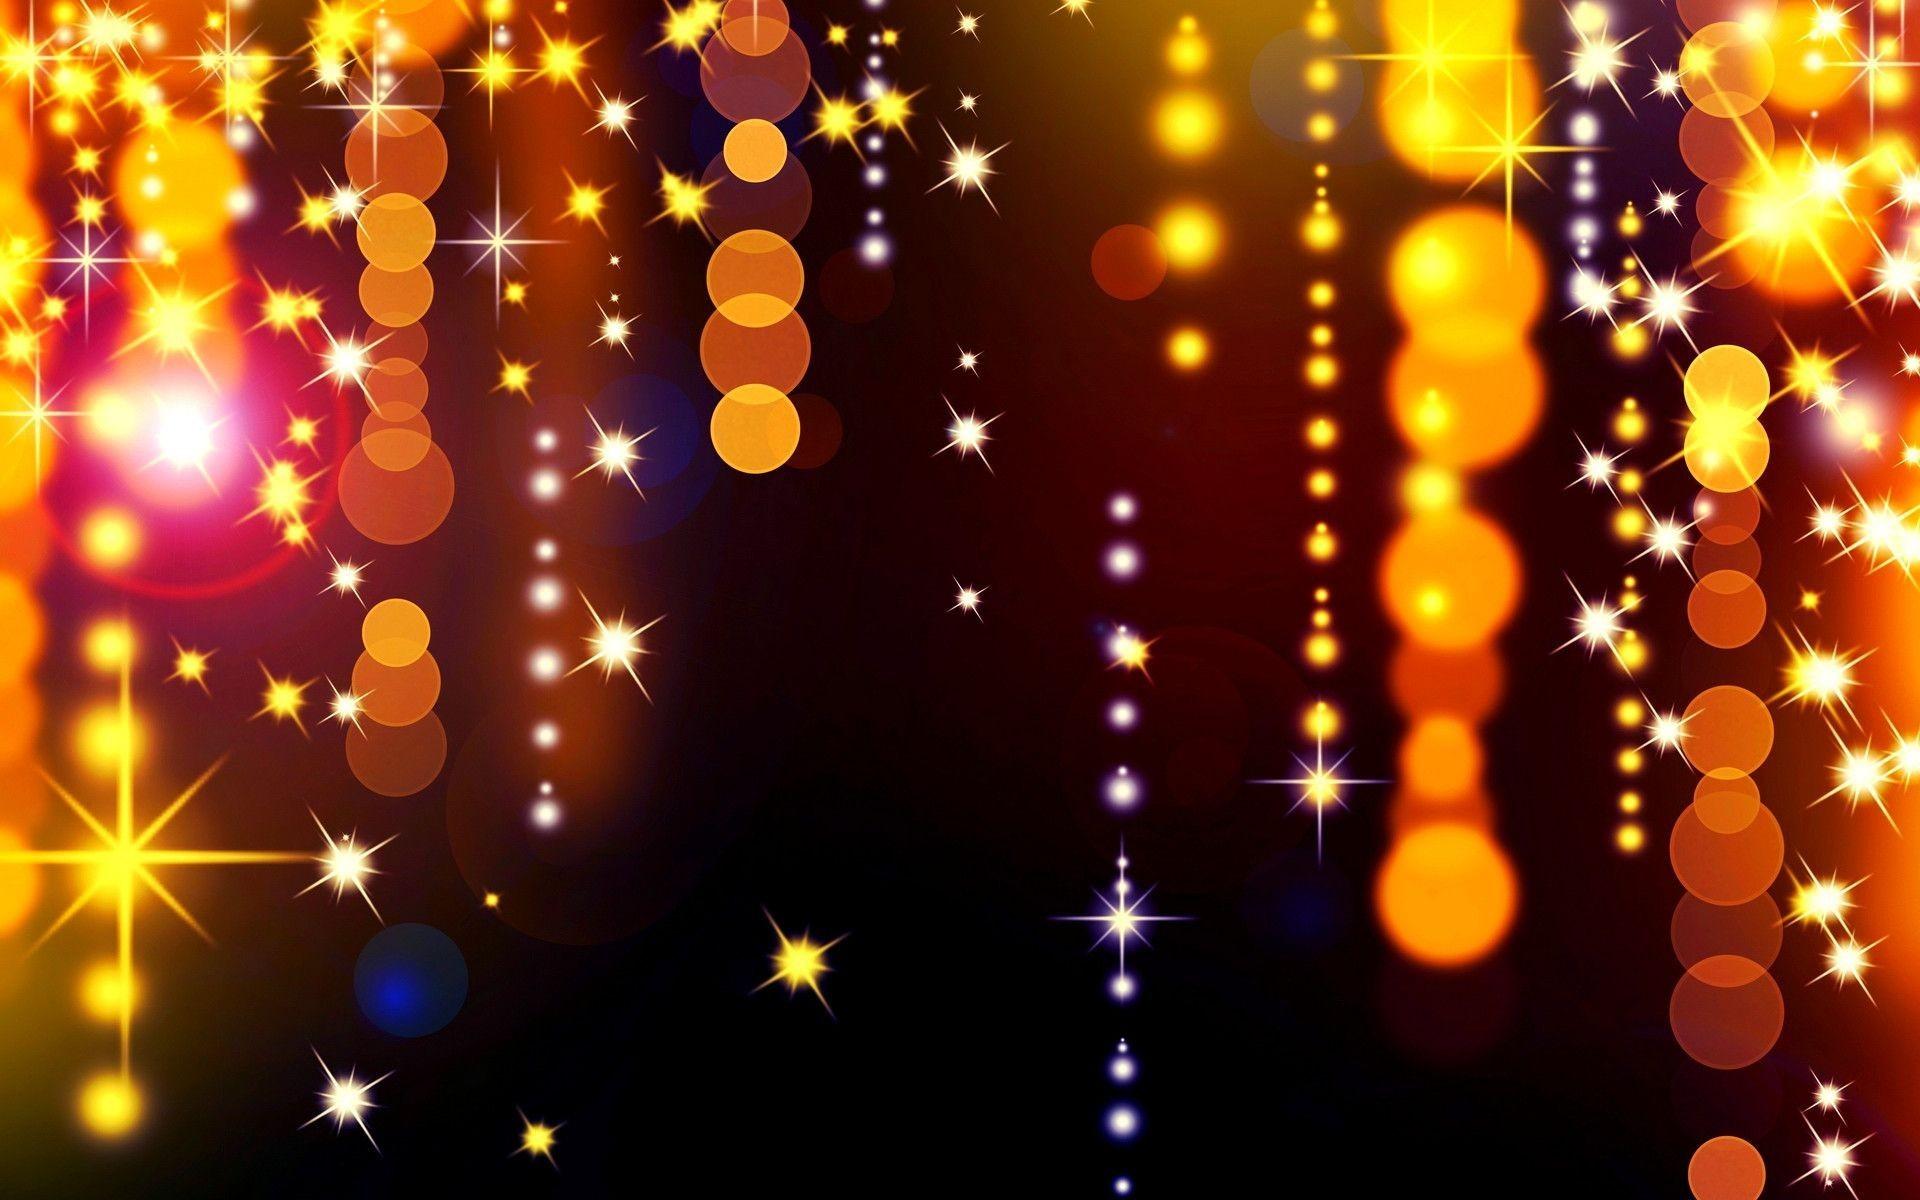 christmas lights wallpaper download